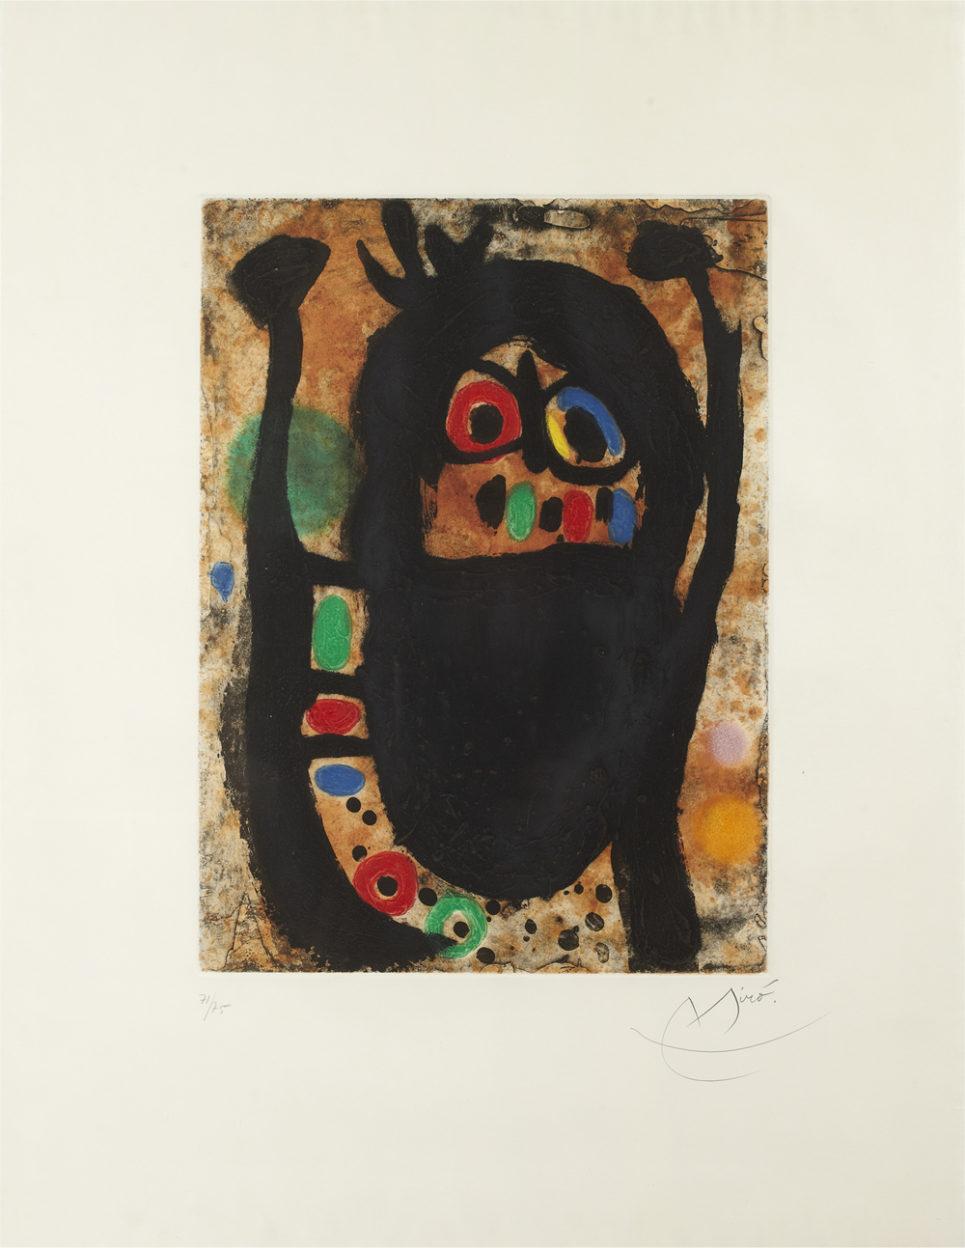 Joan Miro - La Femme aux Bijoux